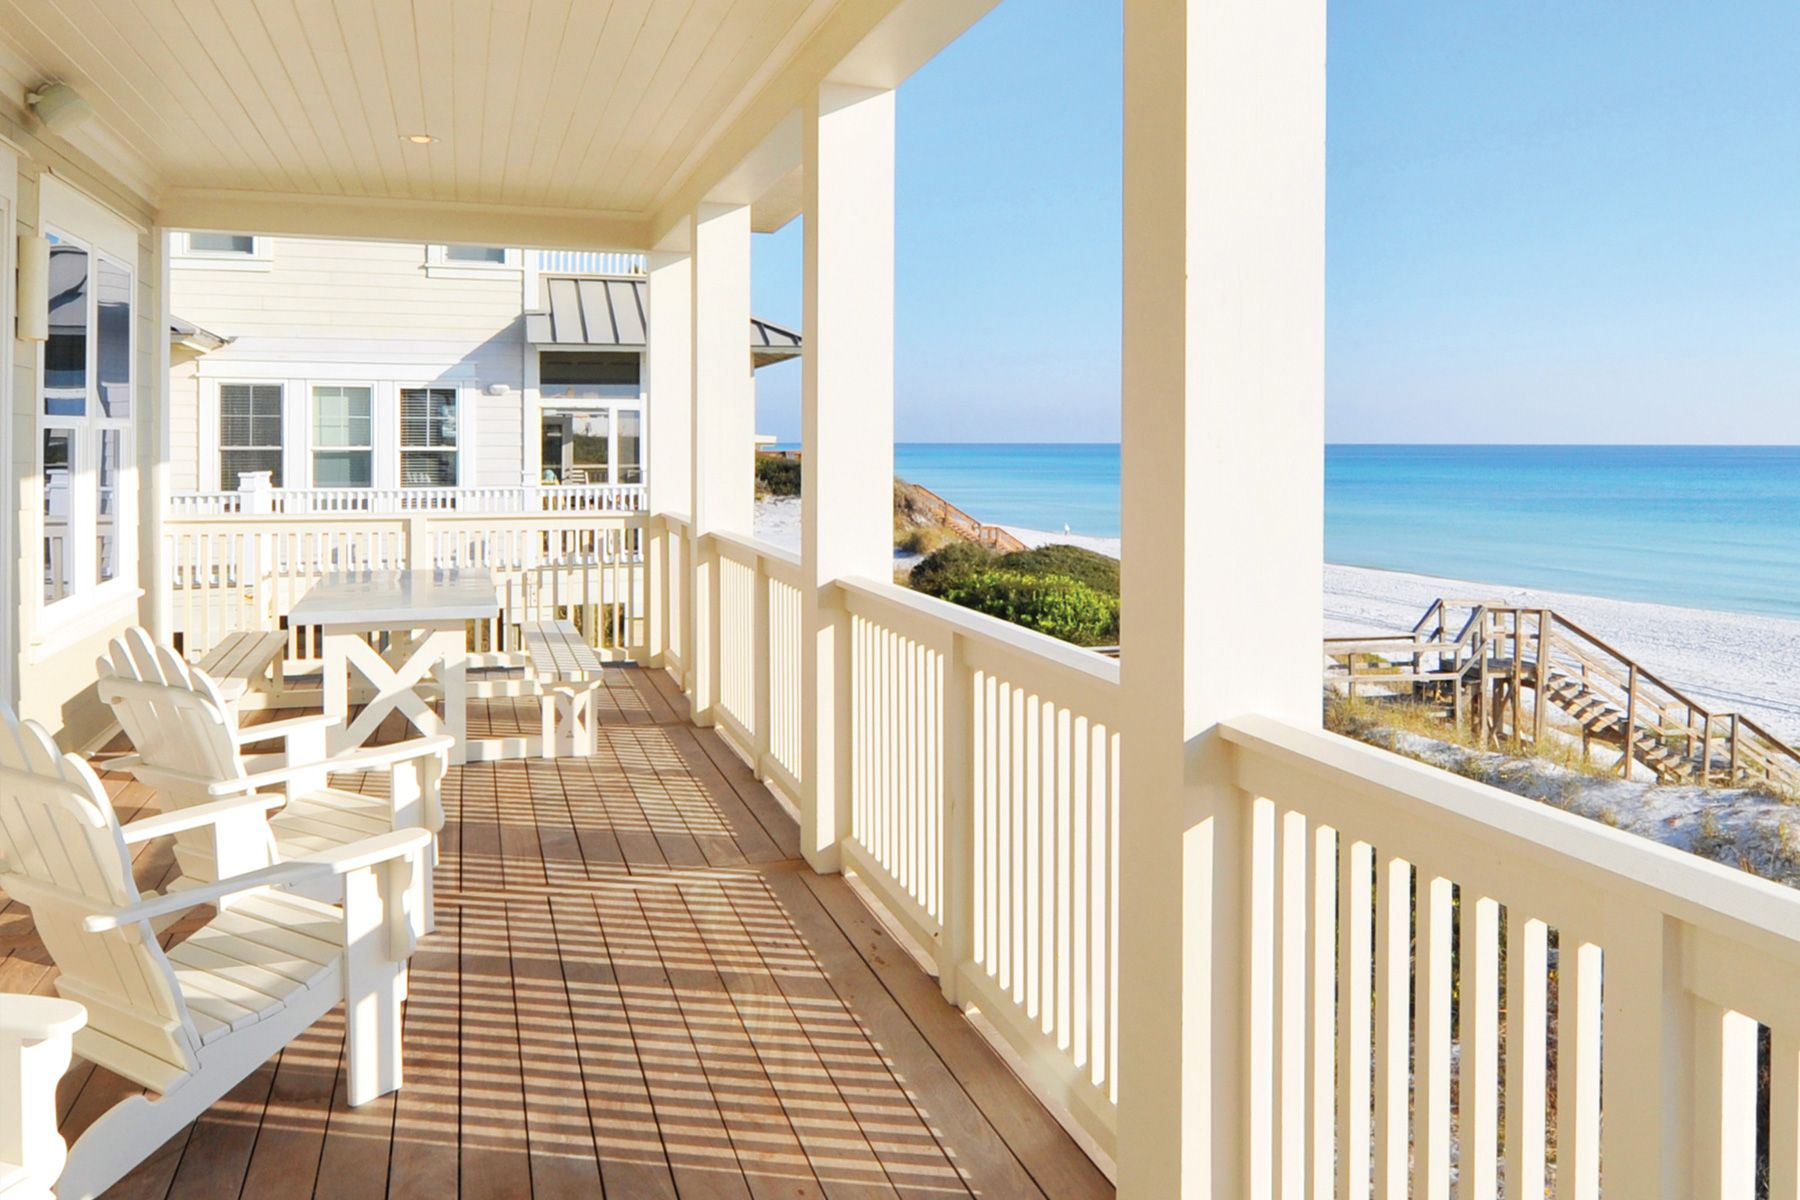 Sit back and enjoy the day at a South Walton Beach house. #Florida #WyndhamVacationRentals